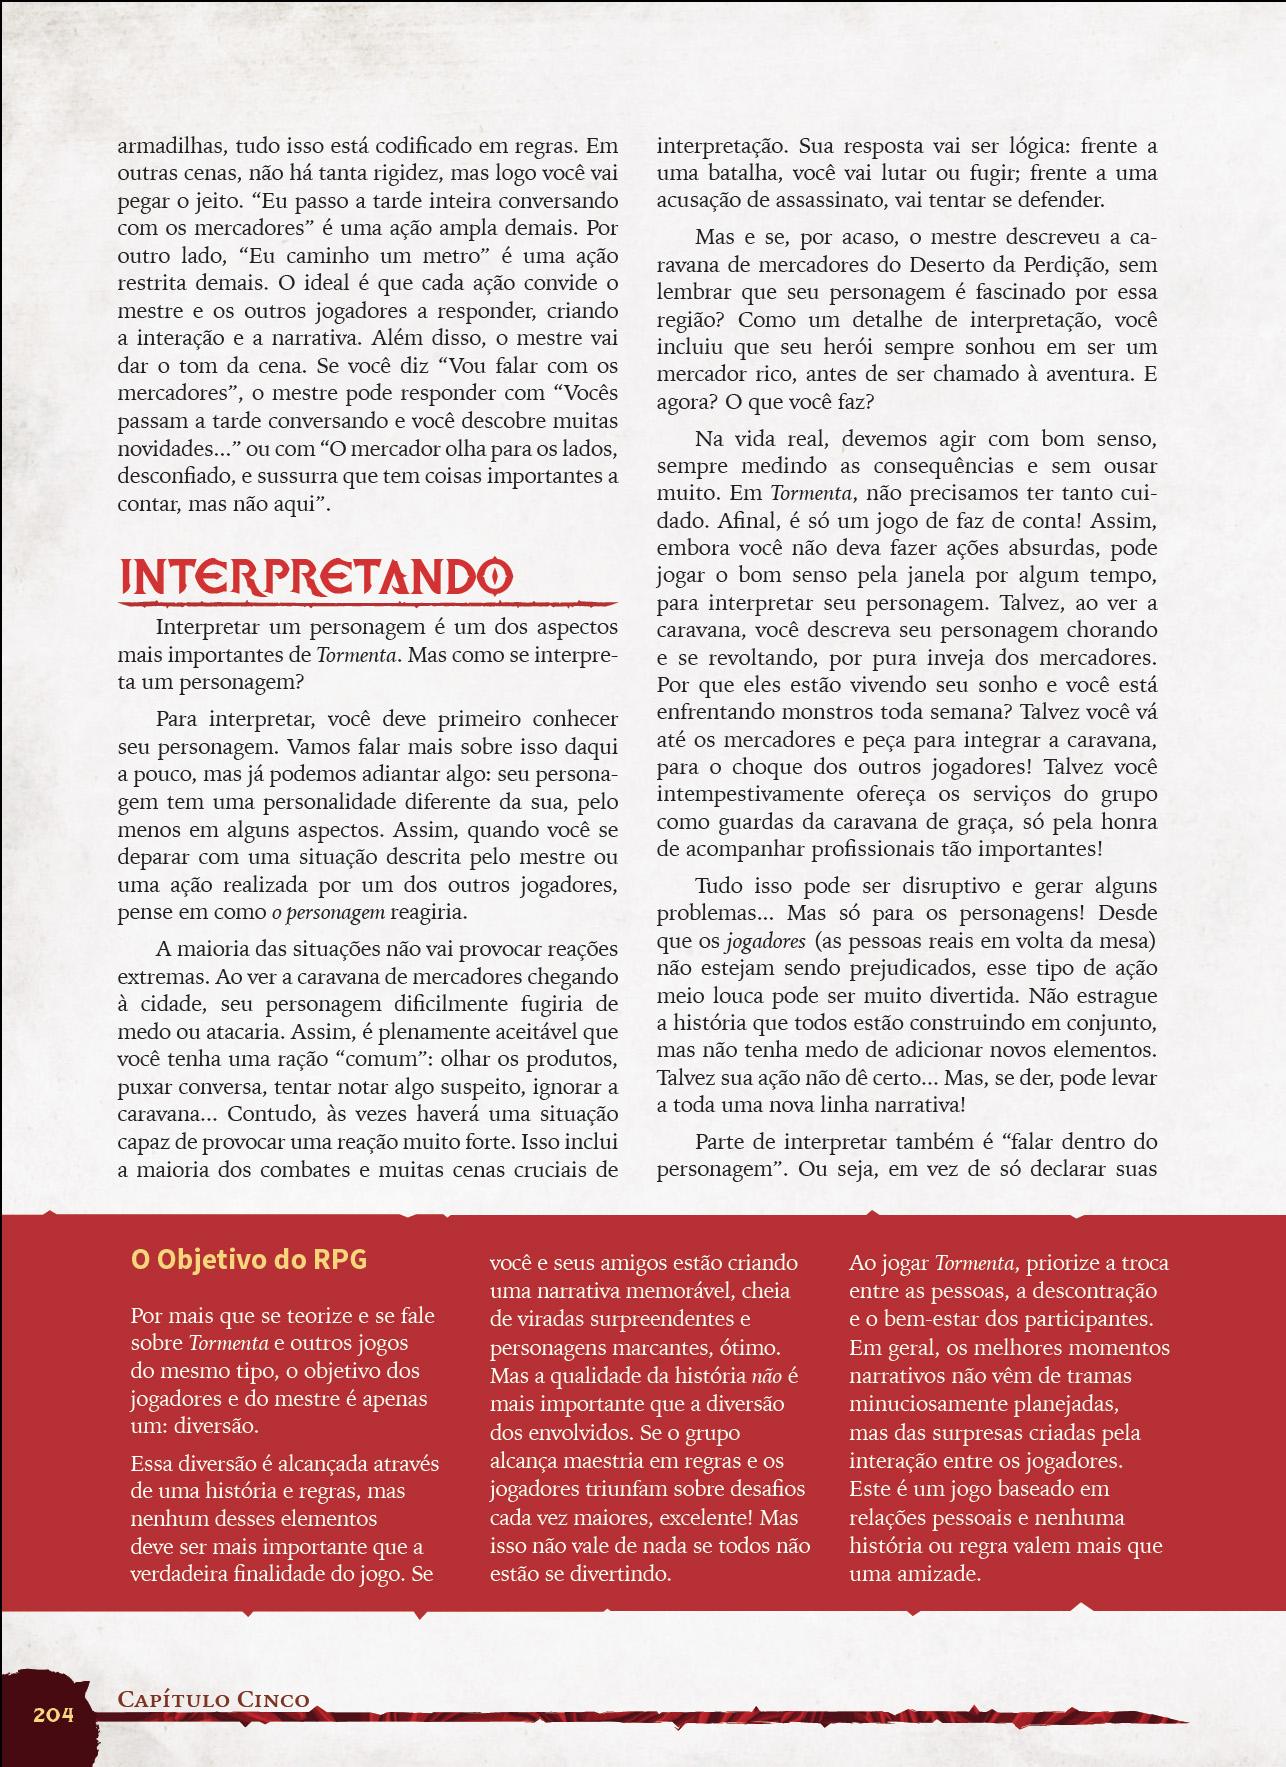 pg204